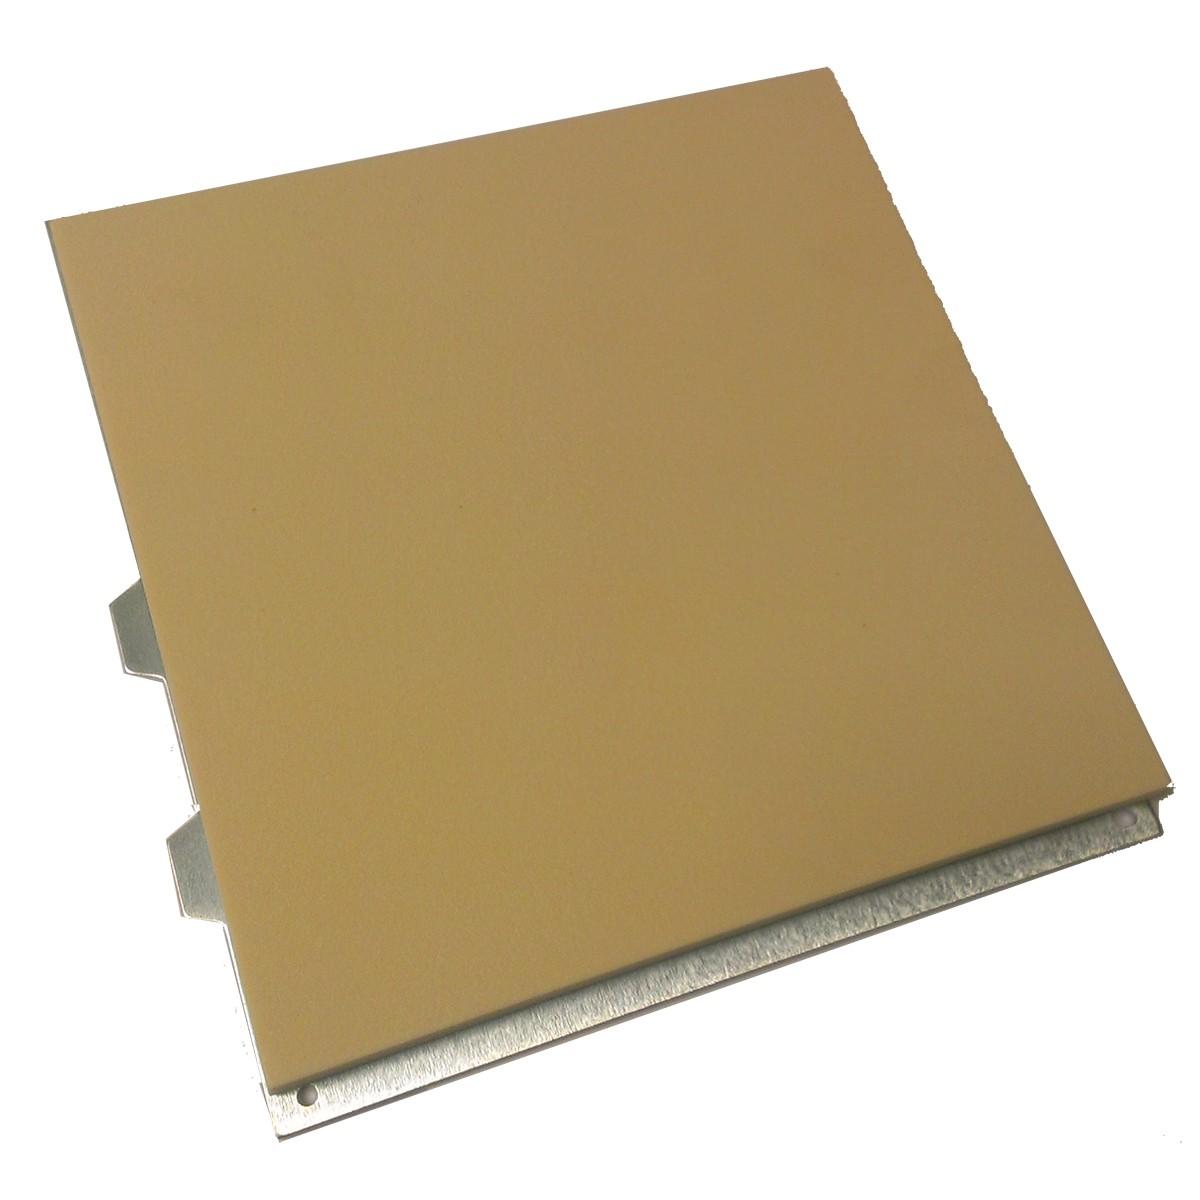 "Solidscape T76 & R66 Series 6"" x 6"" Build Plate"